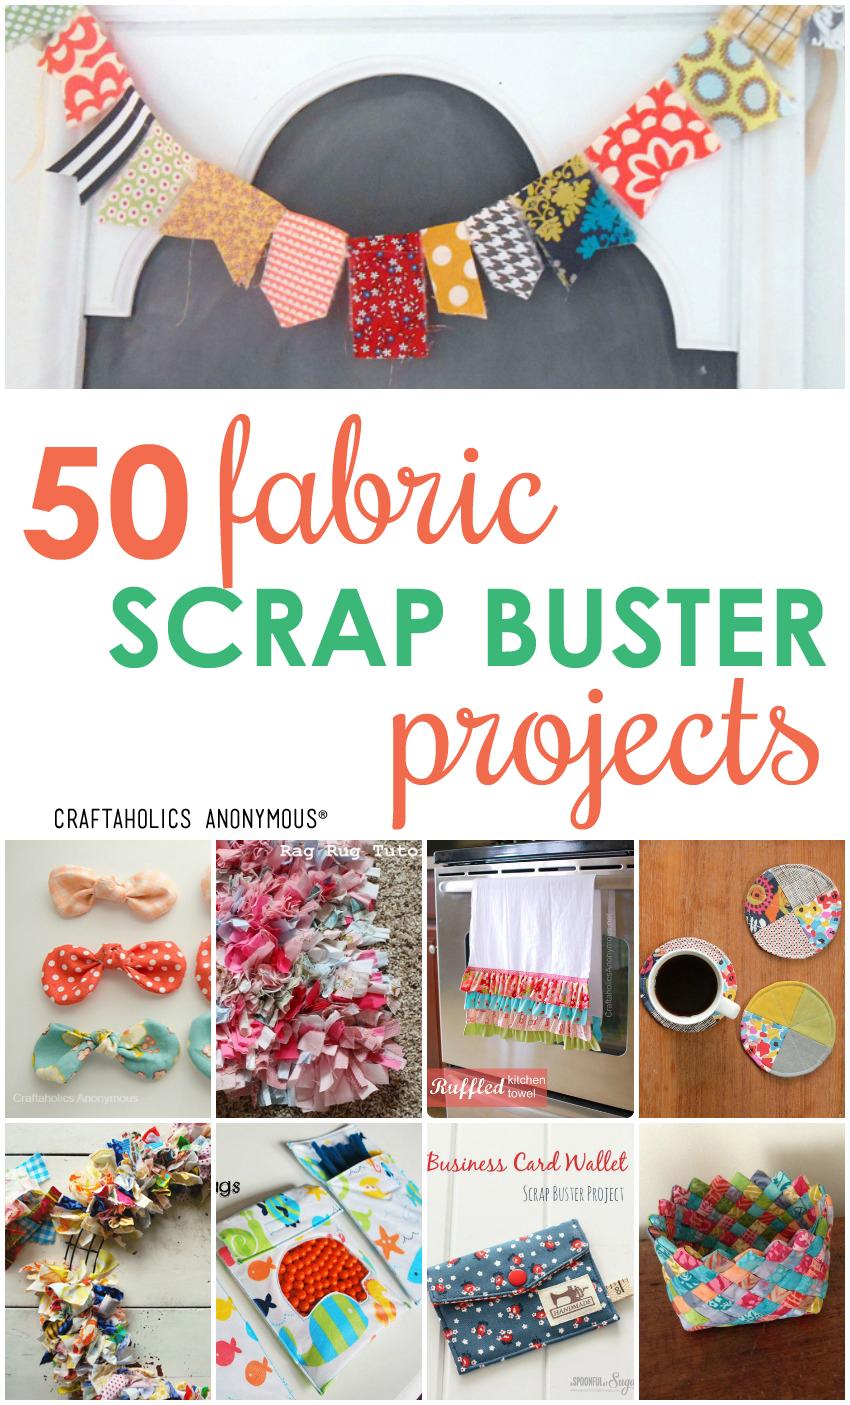 50 Fabric Scrap Projects | Craftaholics Anonymou®